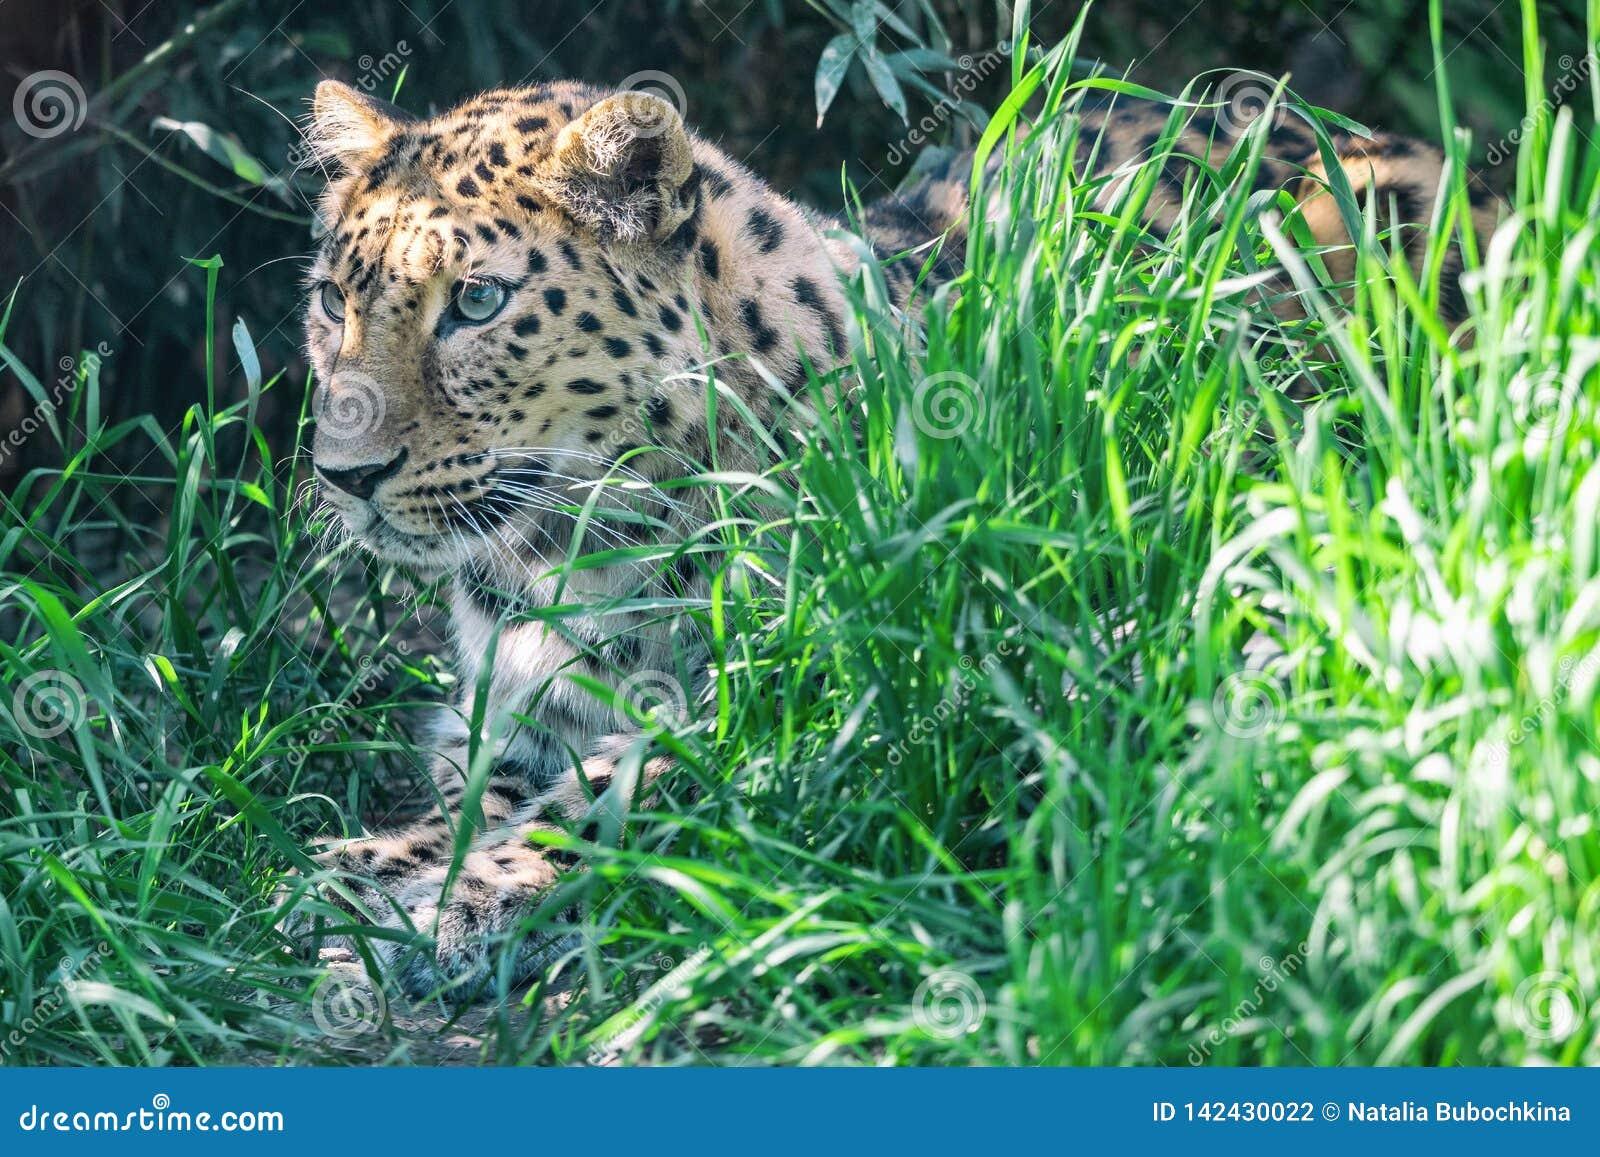 De Amurluipaard ligt in wachttijd onder groen gras